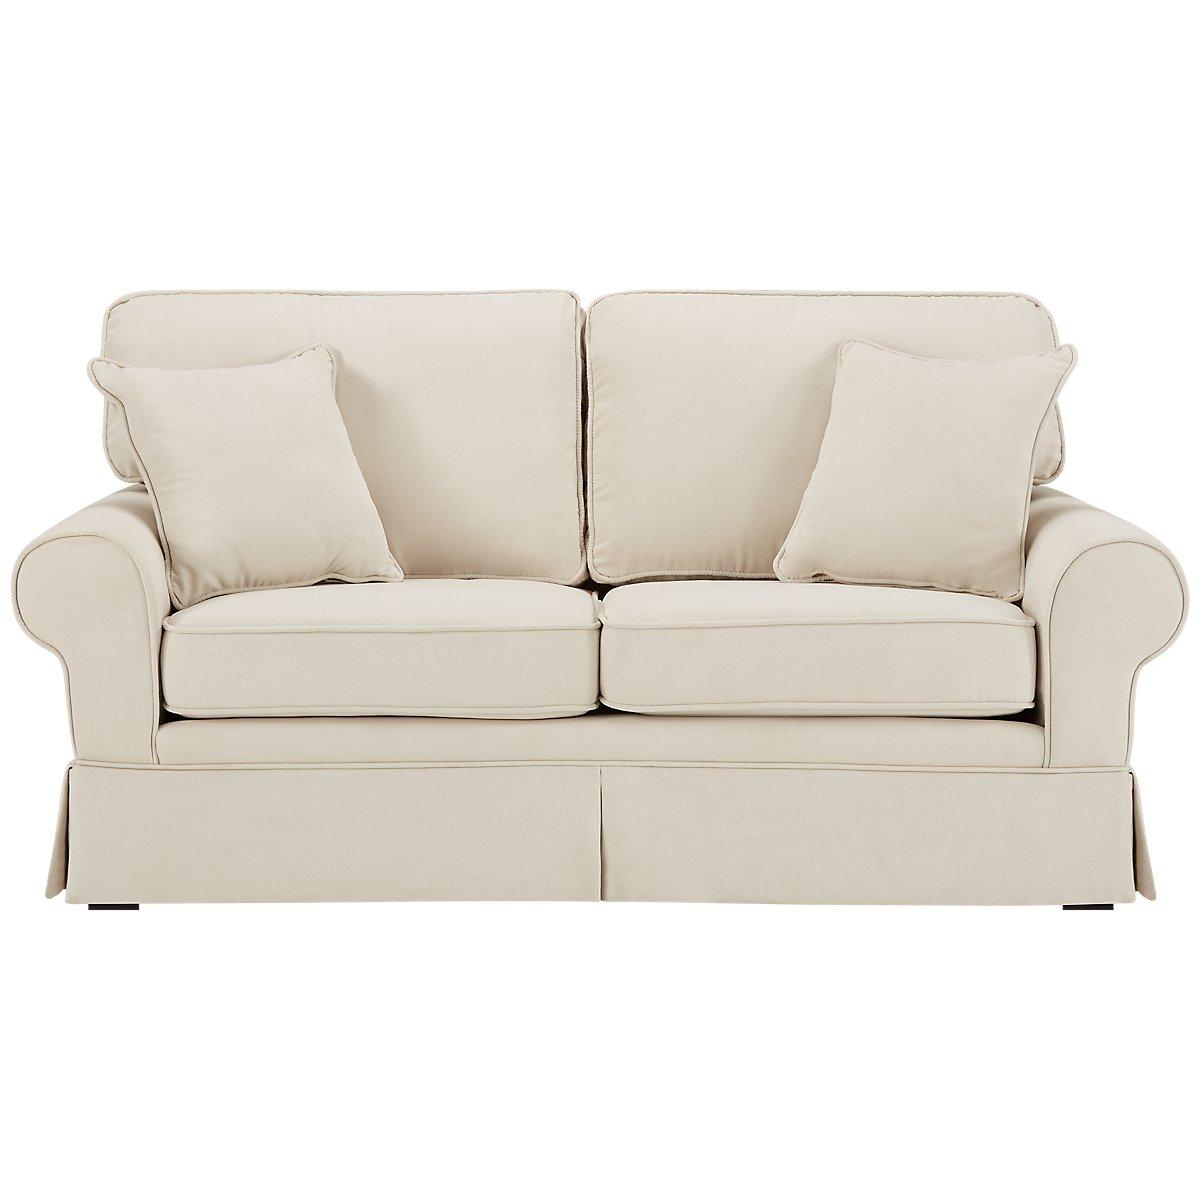 City Furniture: Reese White Small Sofa